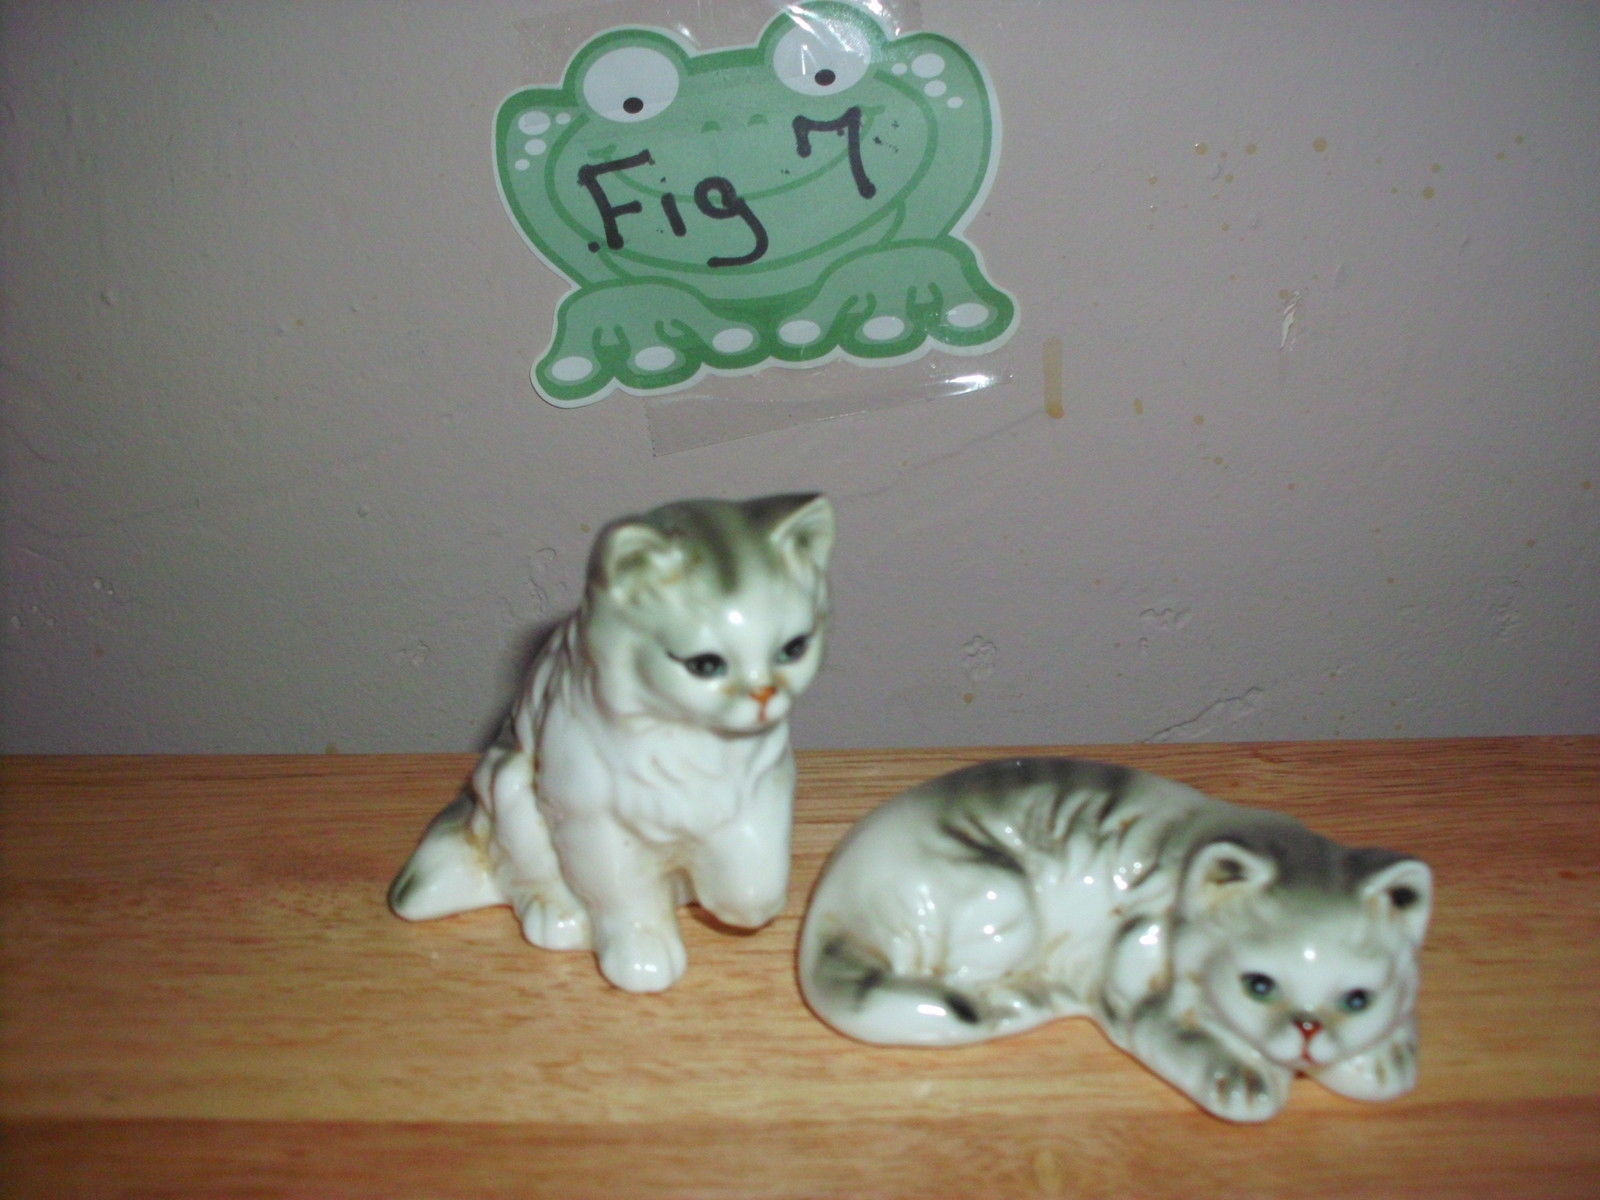 Enesco Cat figurines 1983 - $9.99